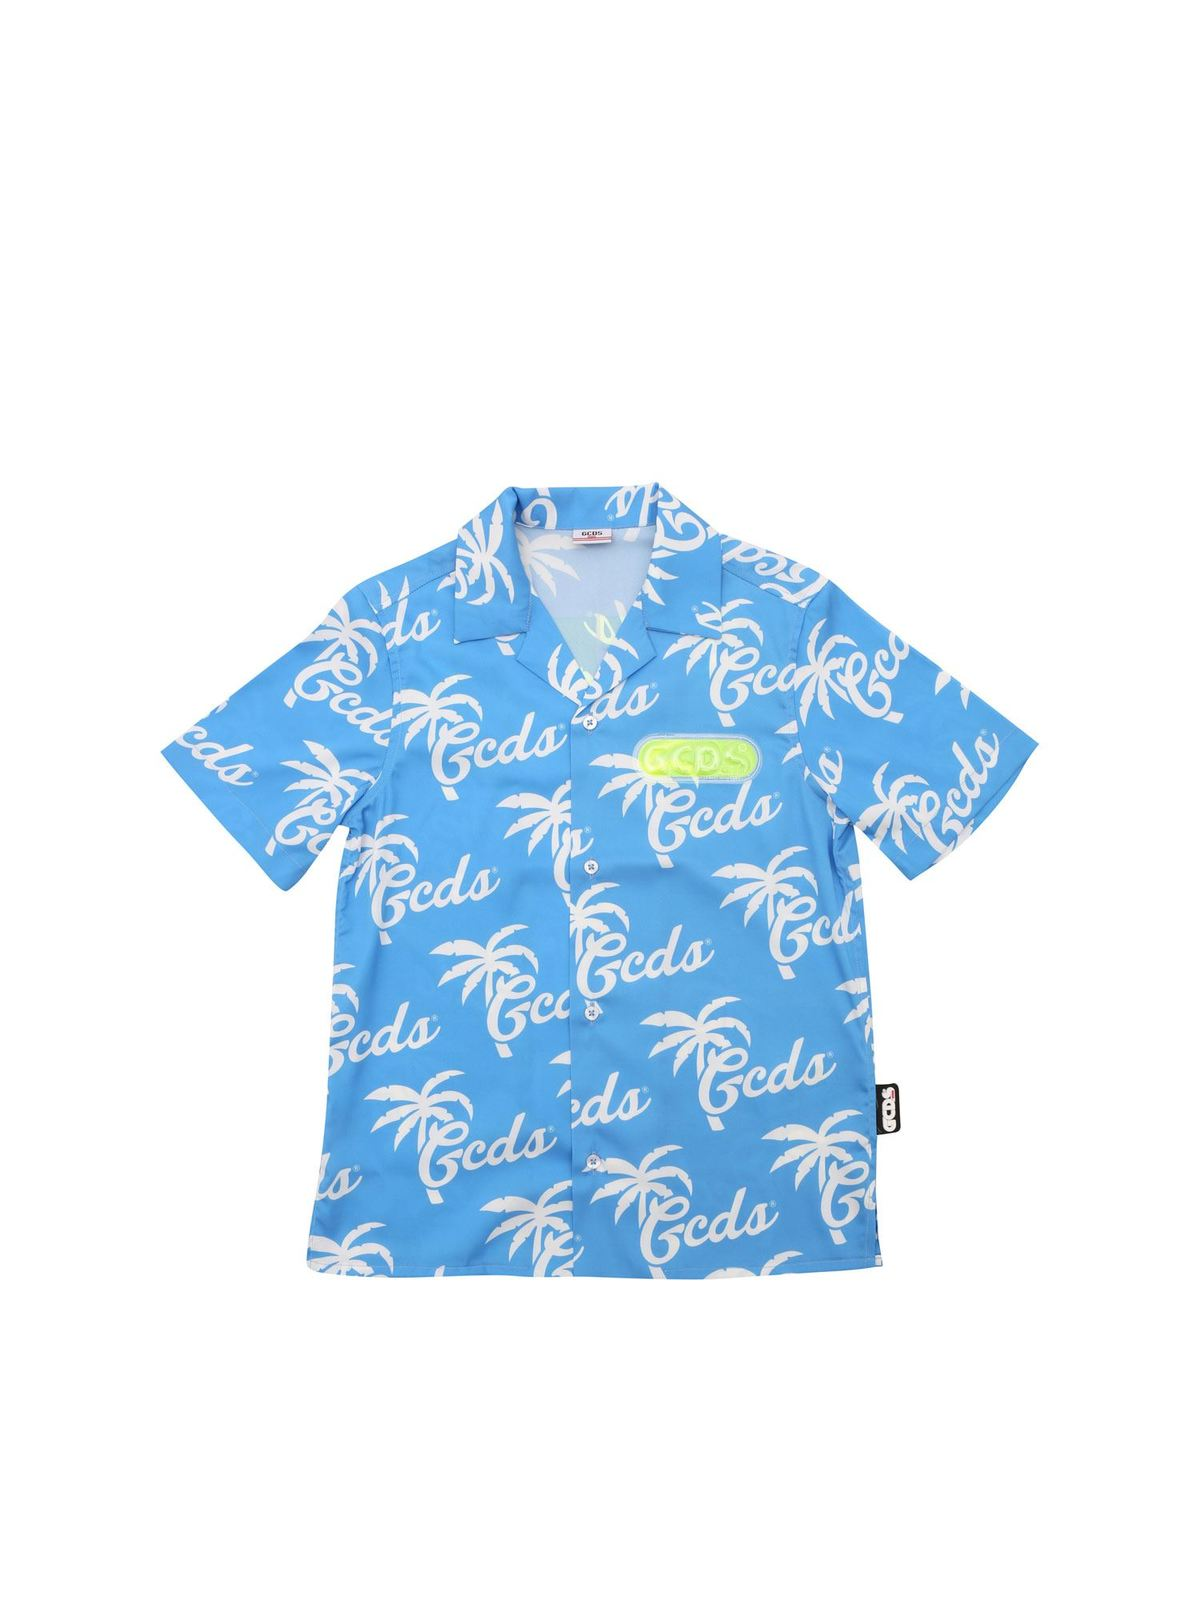 Gcds T-shirts HAWAIIAN SHIRT IN LIGHT BLUE AND WHITE